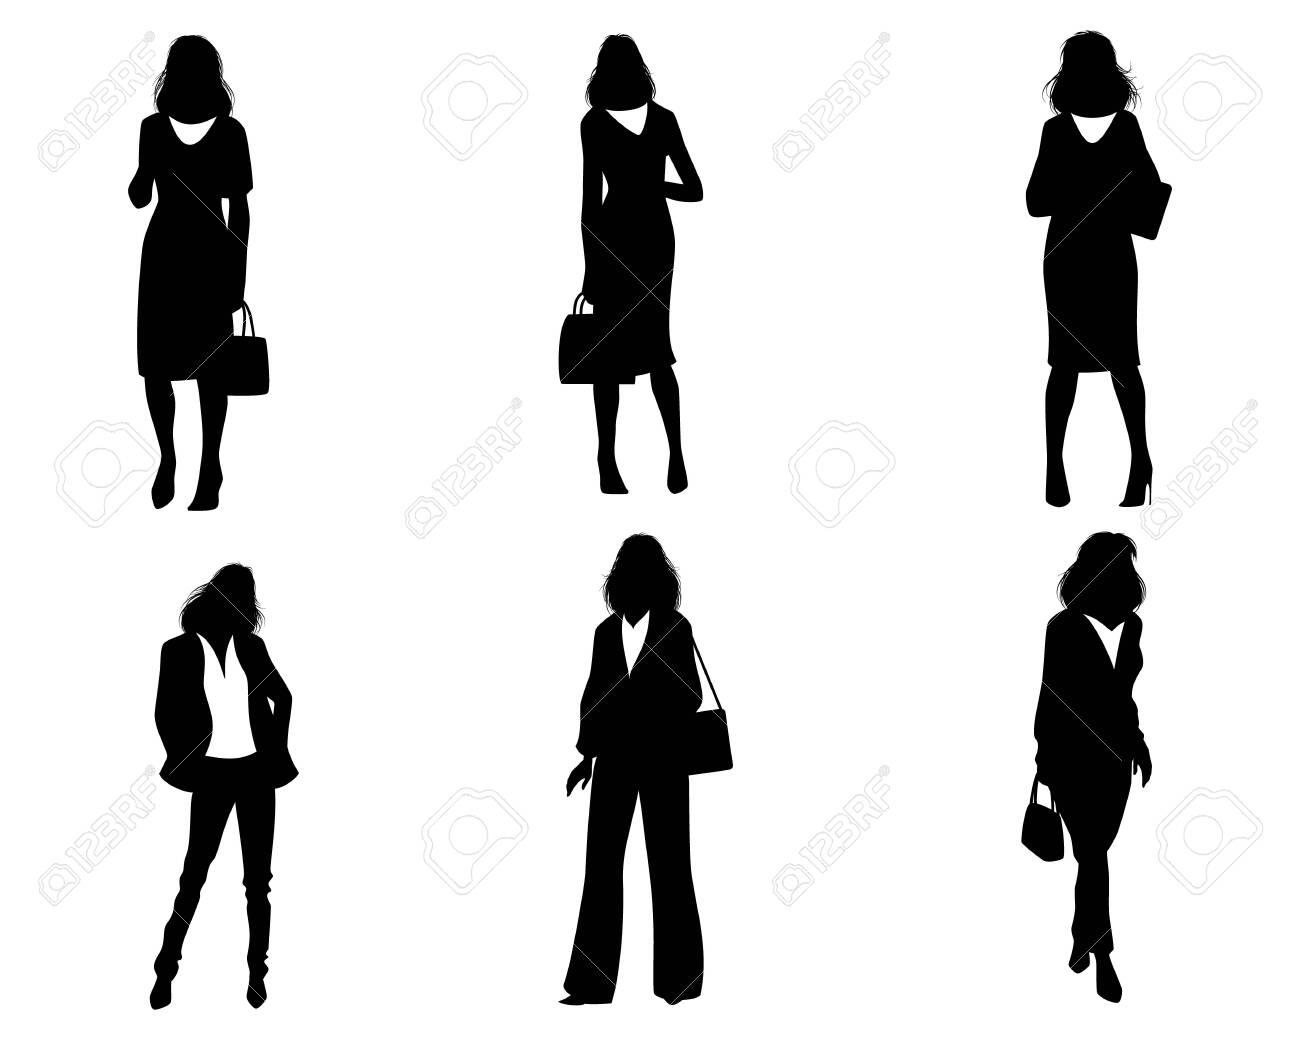 Vector illustration of silhouettes of modern women - 136888580